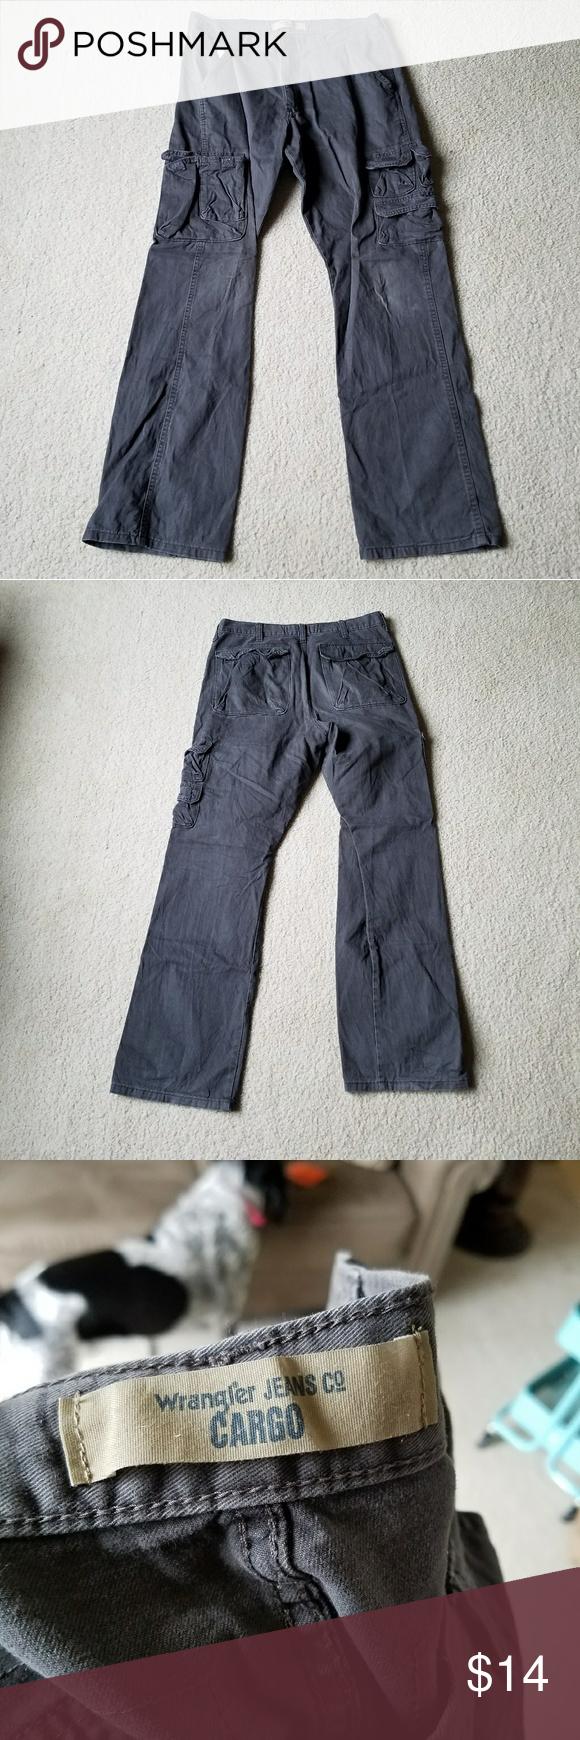 Men's grey flannel trousers  Menus x Wrangler Grey Cargo Pants  Cargo pants Gray and